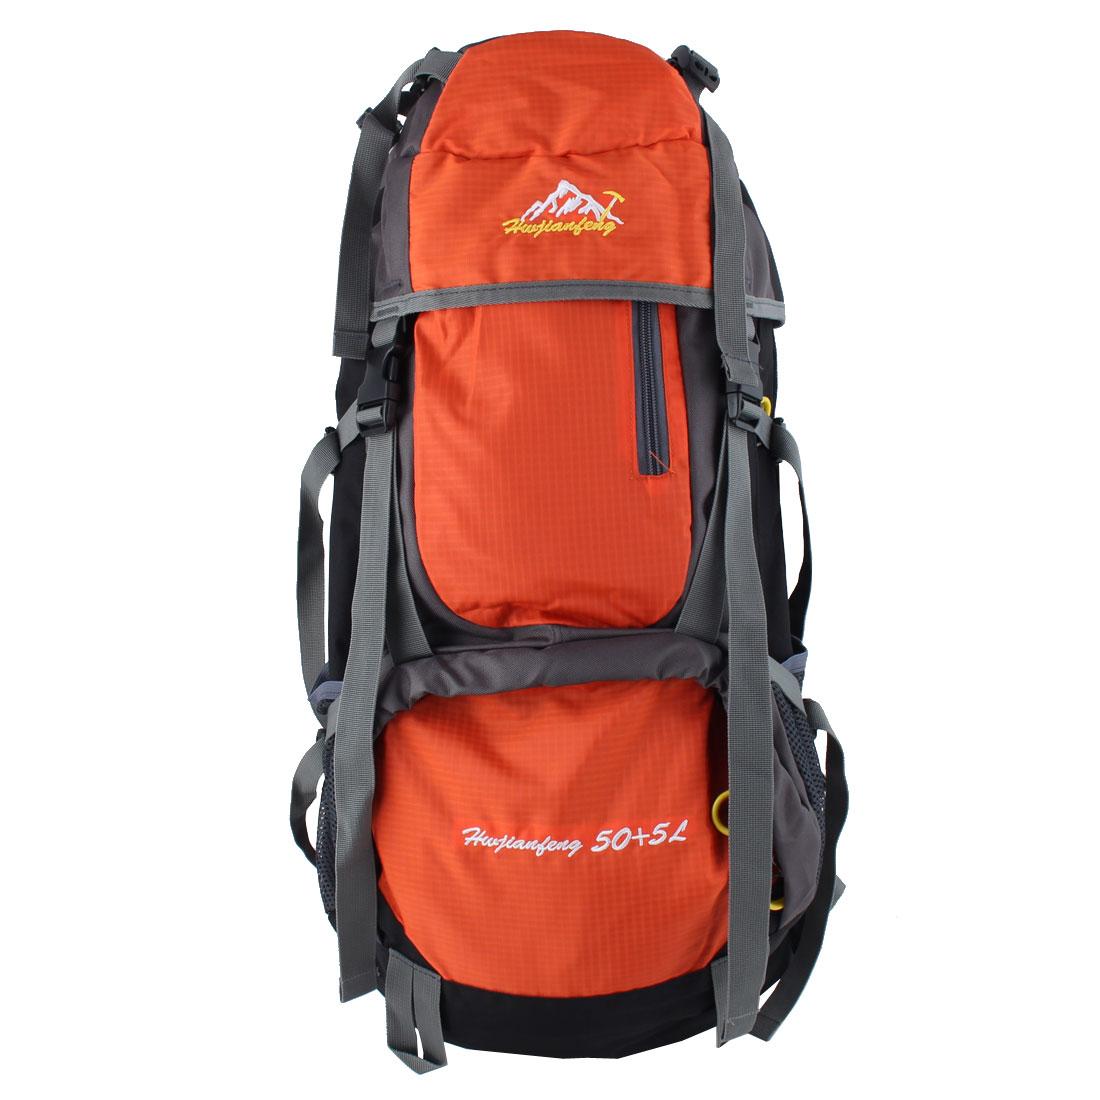 HWJIANFENG Authorized Outdoor Trekking Pack Sport Bag Hiking Backpack Orange 55L